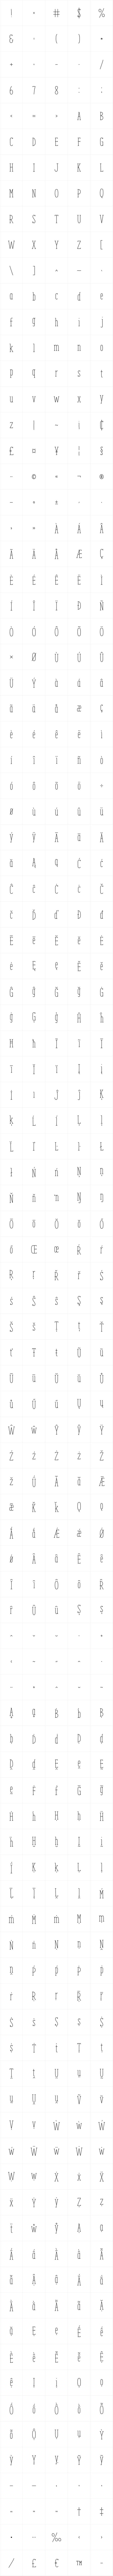 Enyo Serif